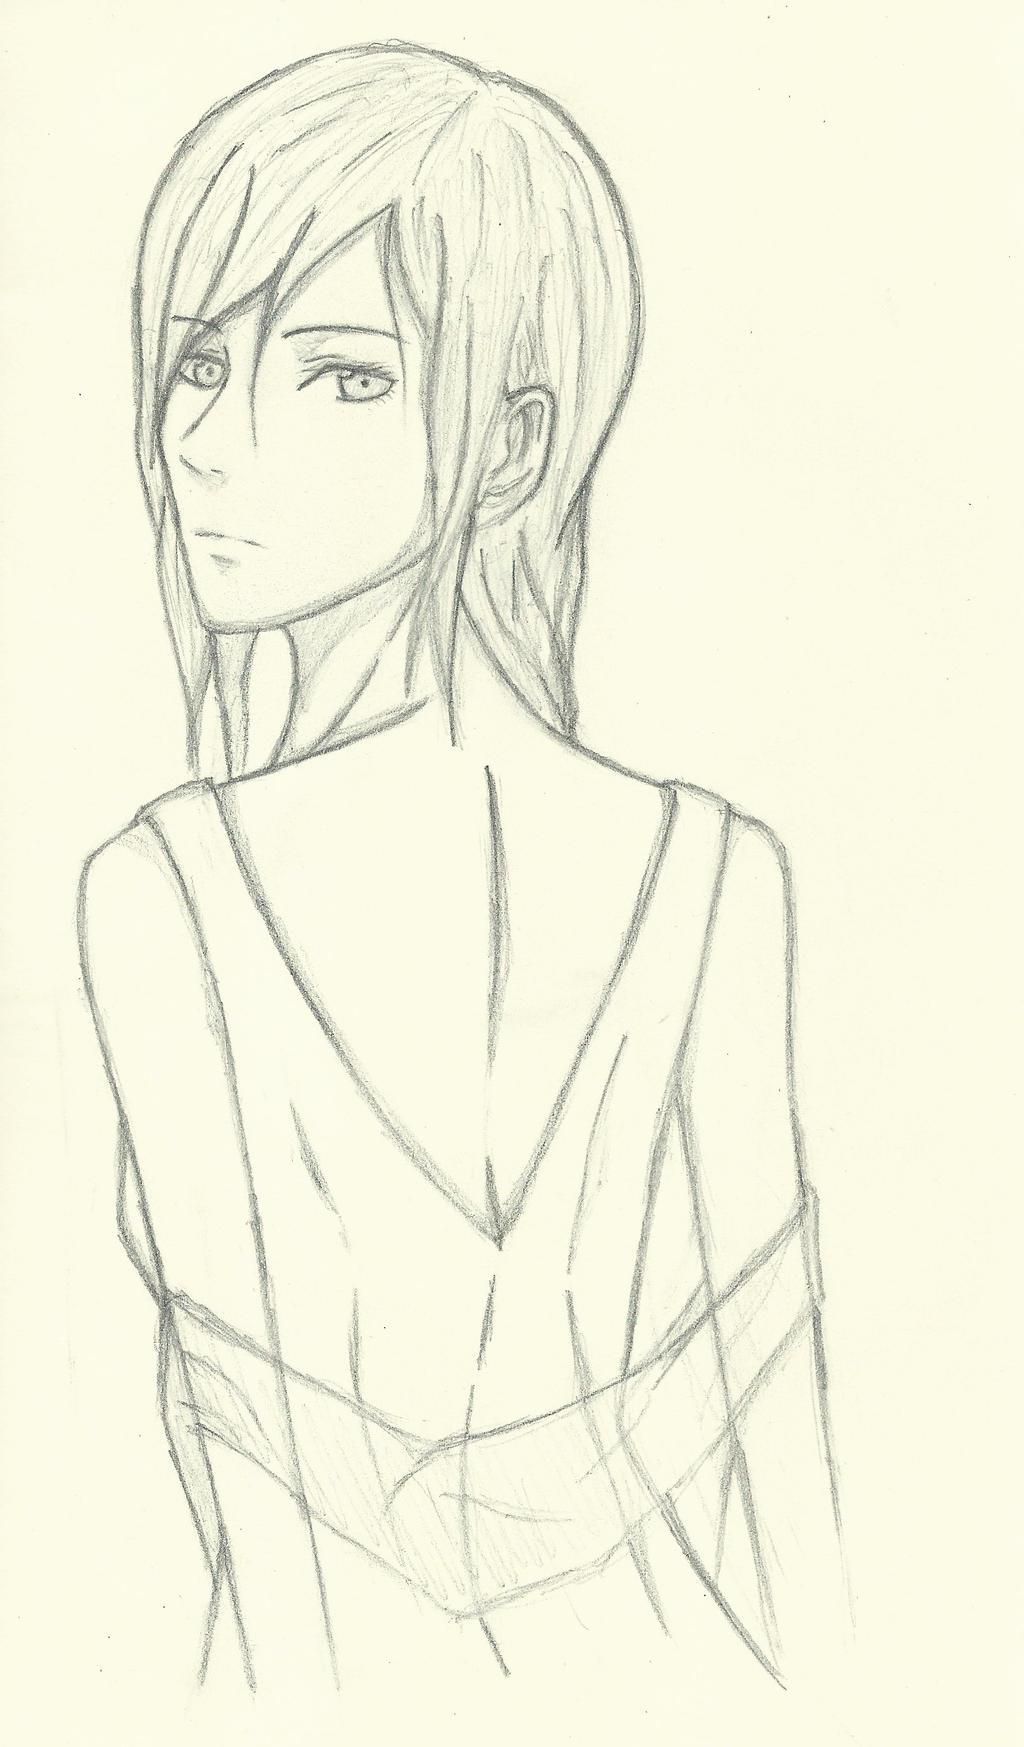 Glamorous Manga Girl Looking Over Shoulder By Musicfreak8800